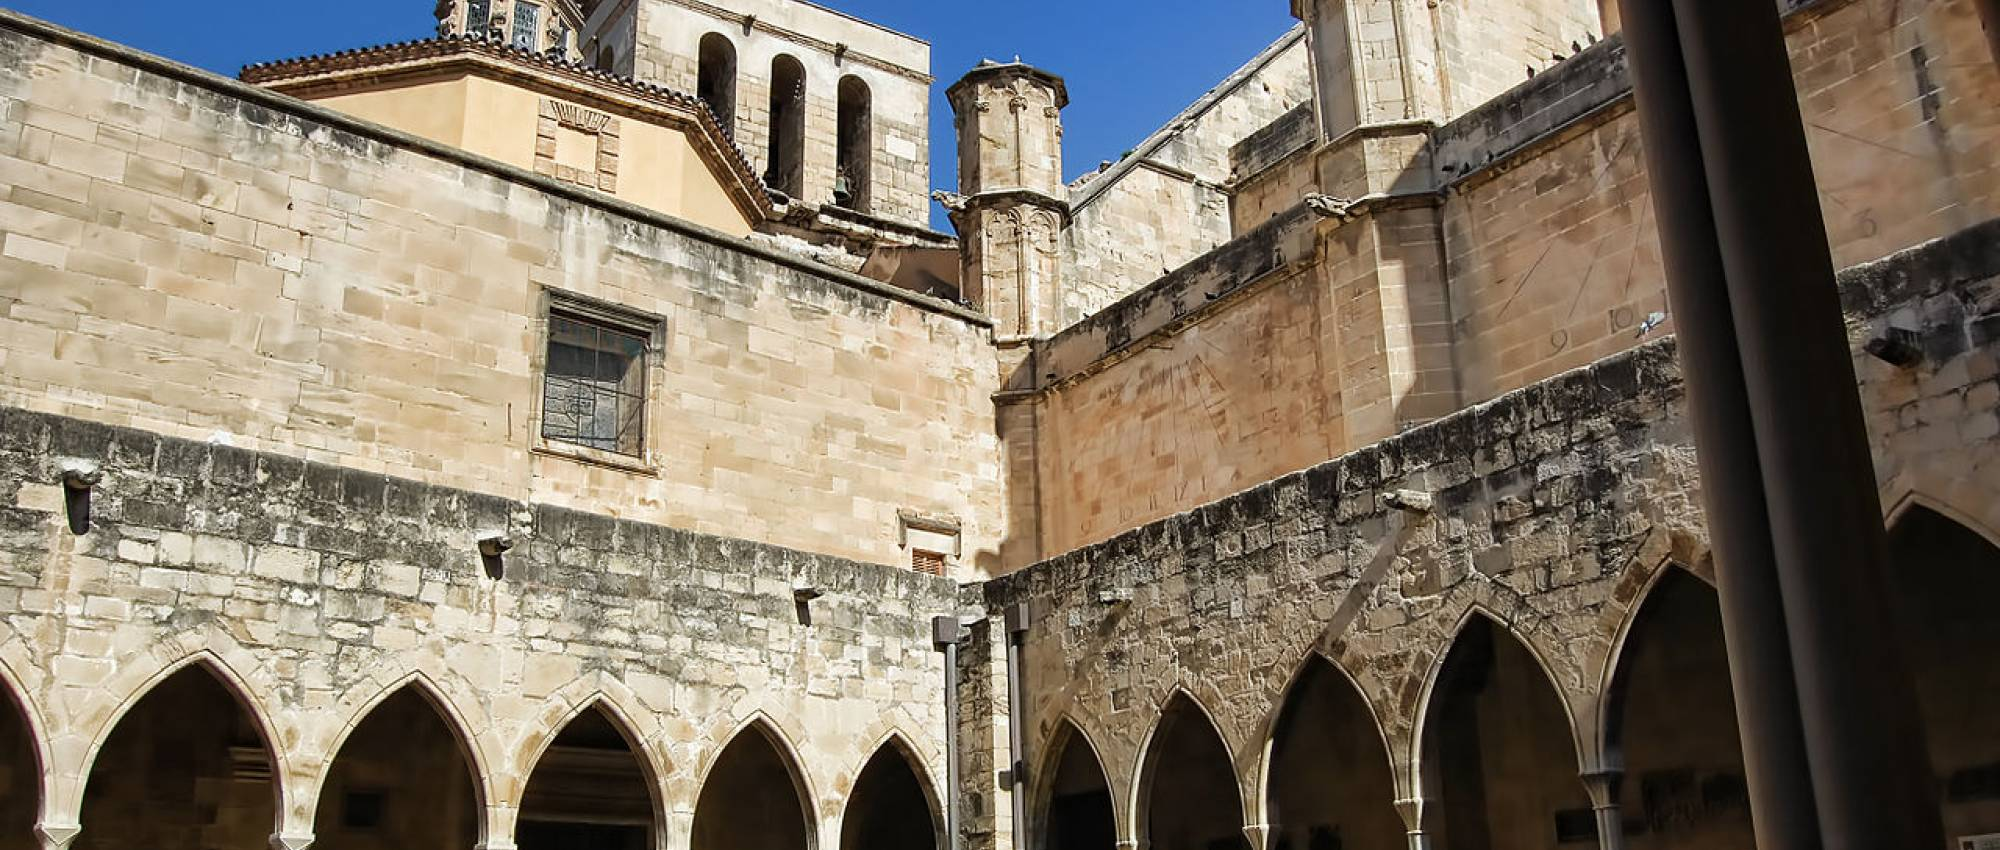 Claustre de la catedral de Sta. Maria de Tortosa. Carme Ribes Moreno / Wikimedia Commons. CC BY-SA 3.0